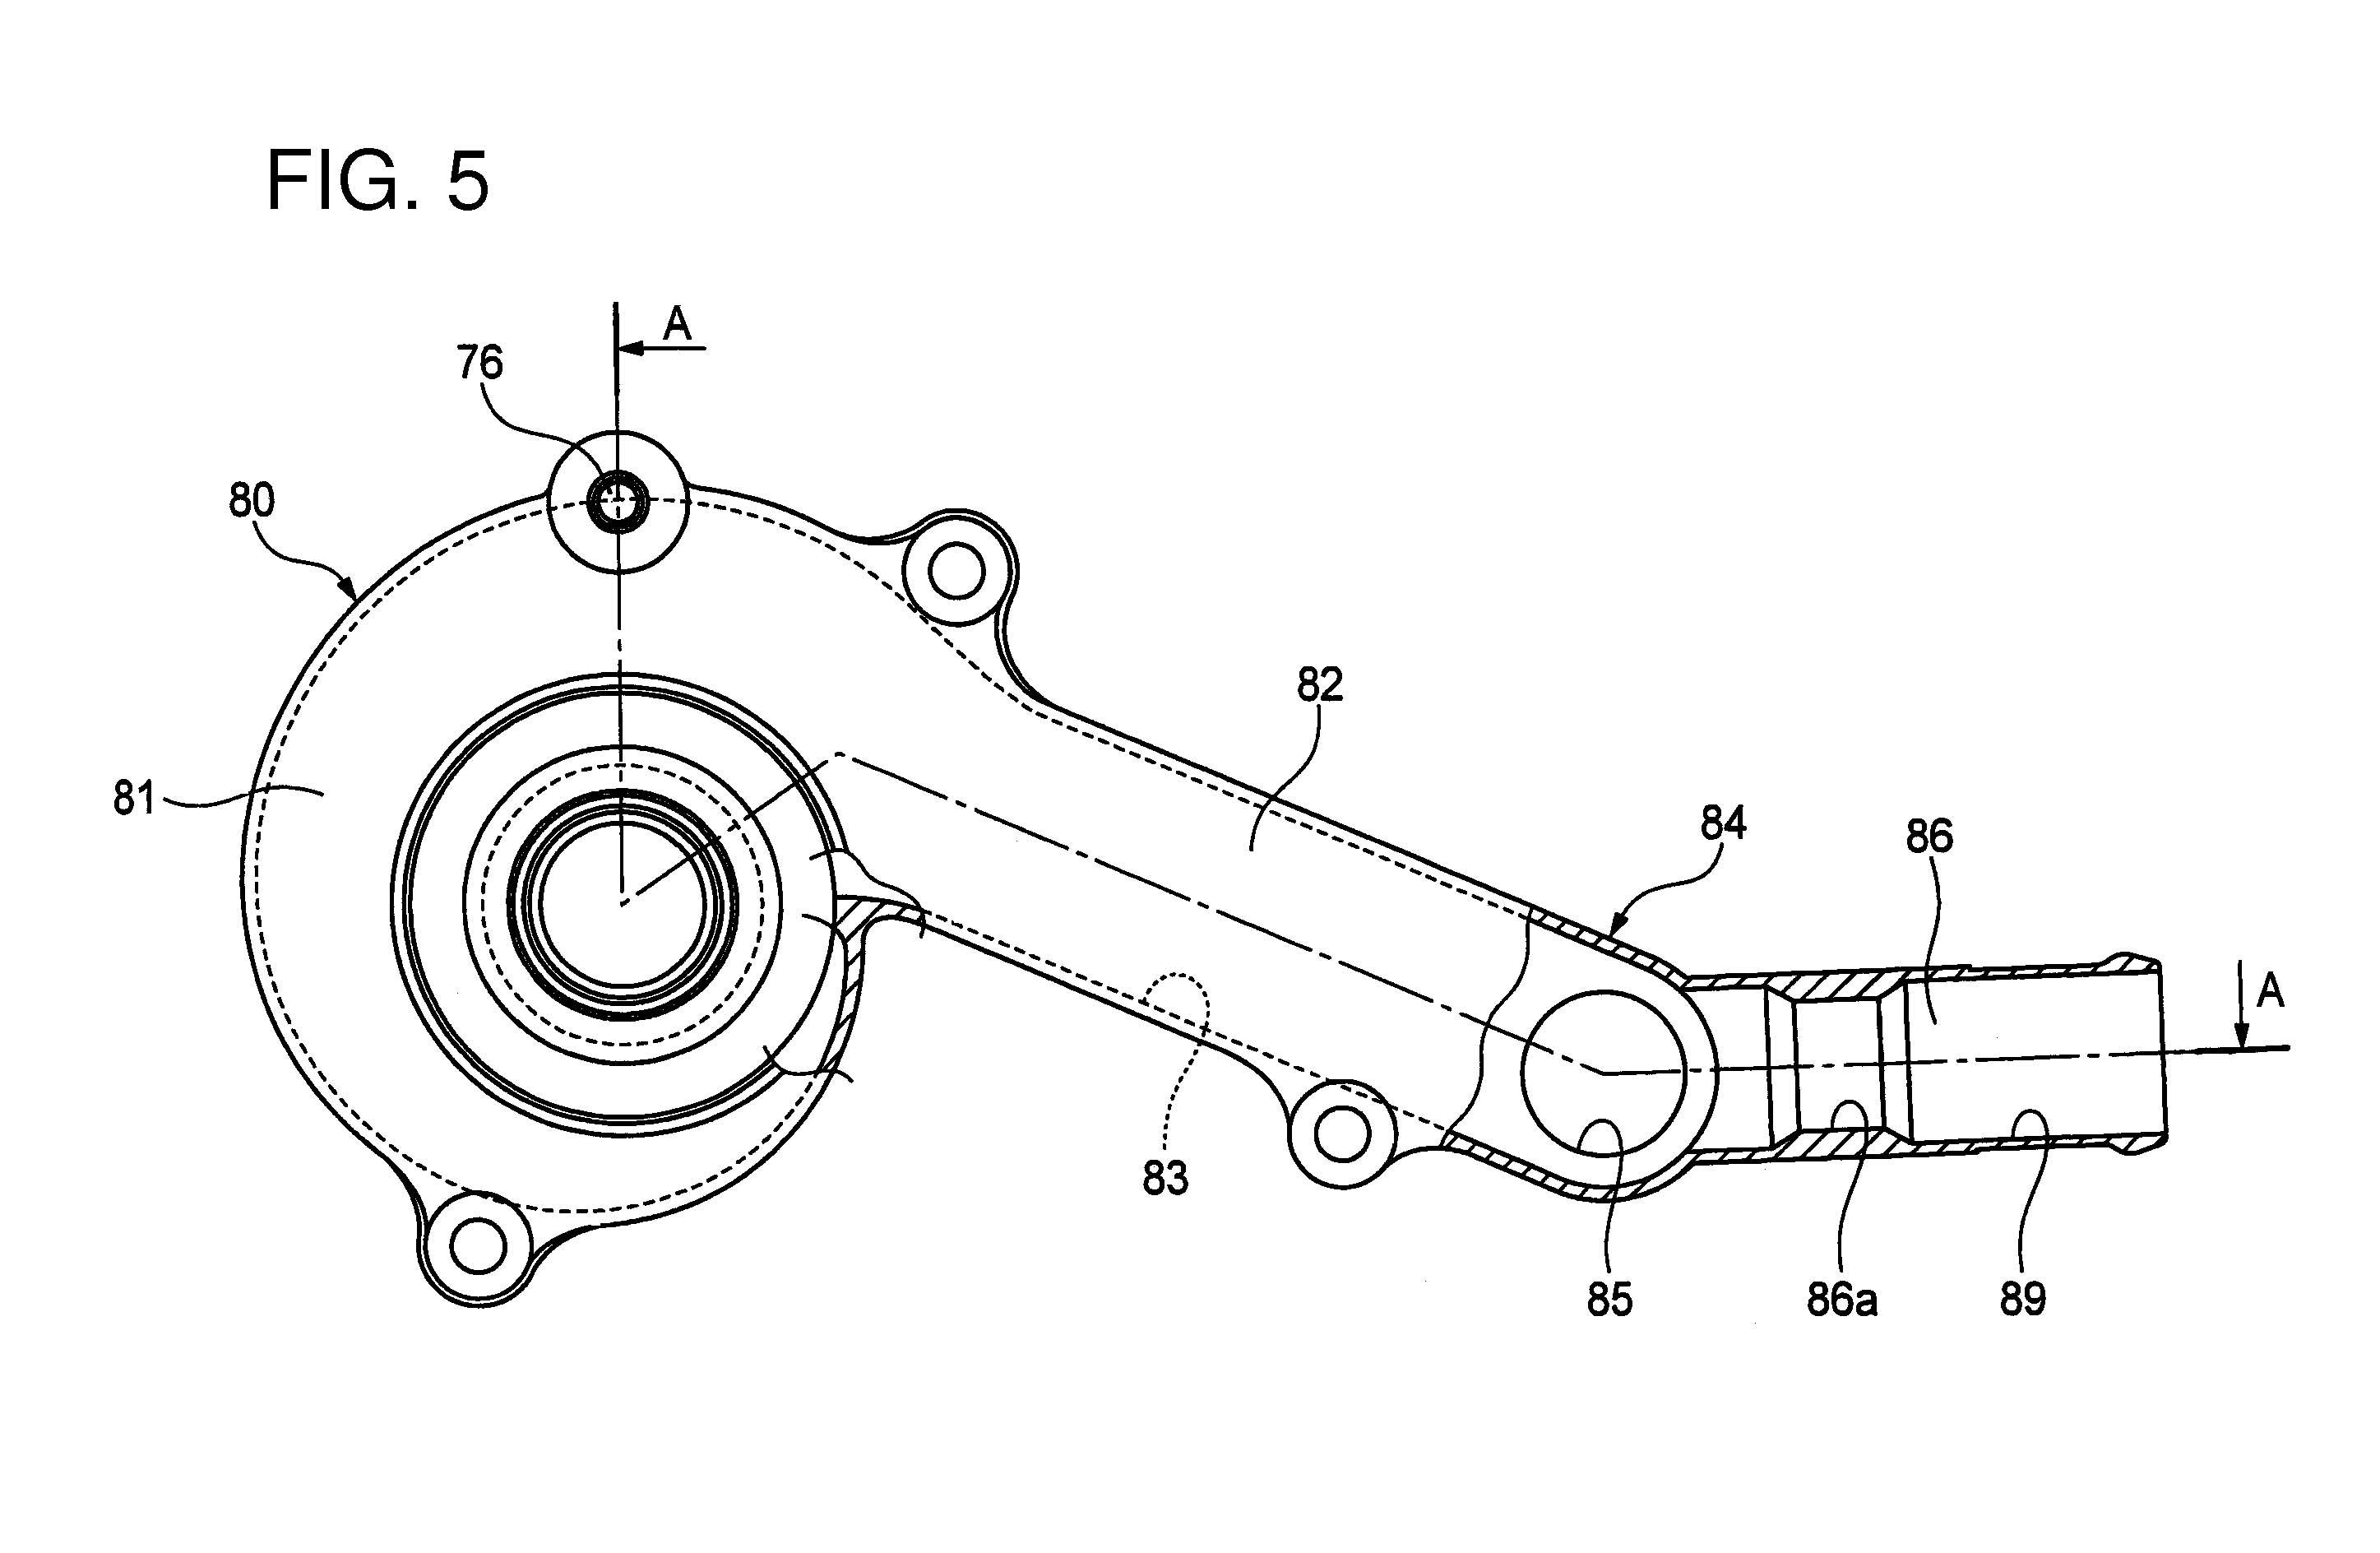 V4 Engine Diagram Wiring Library Gm Modular Ecotec Honda Patent 02